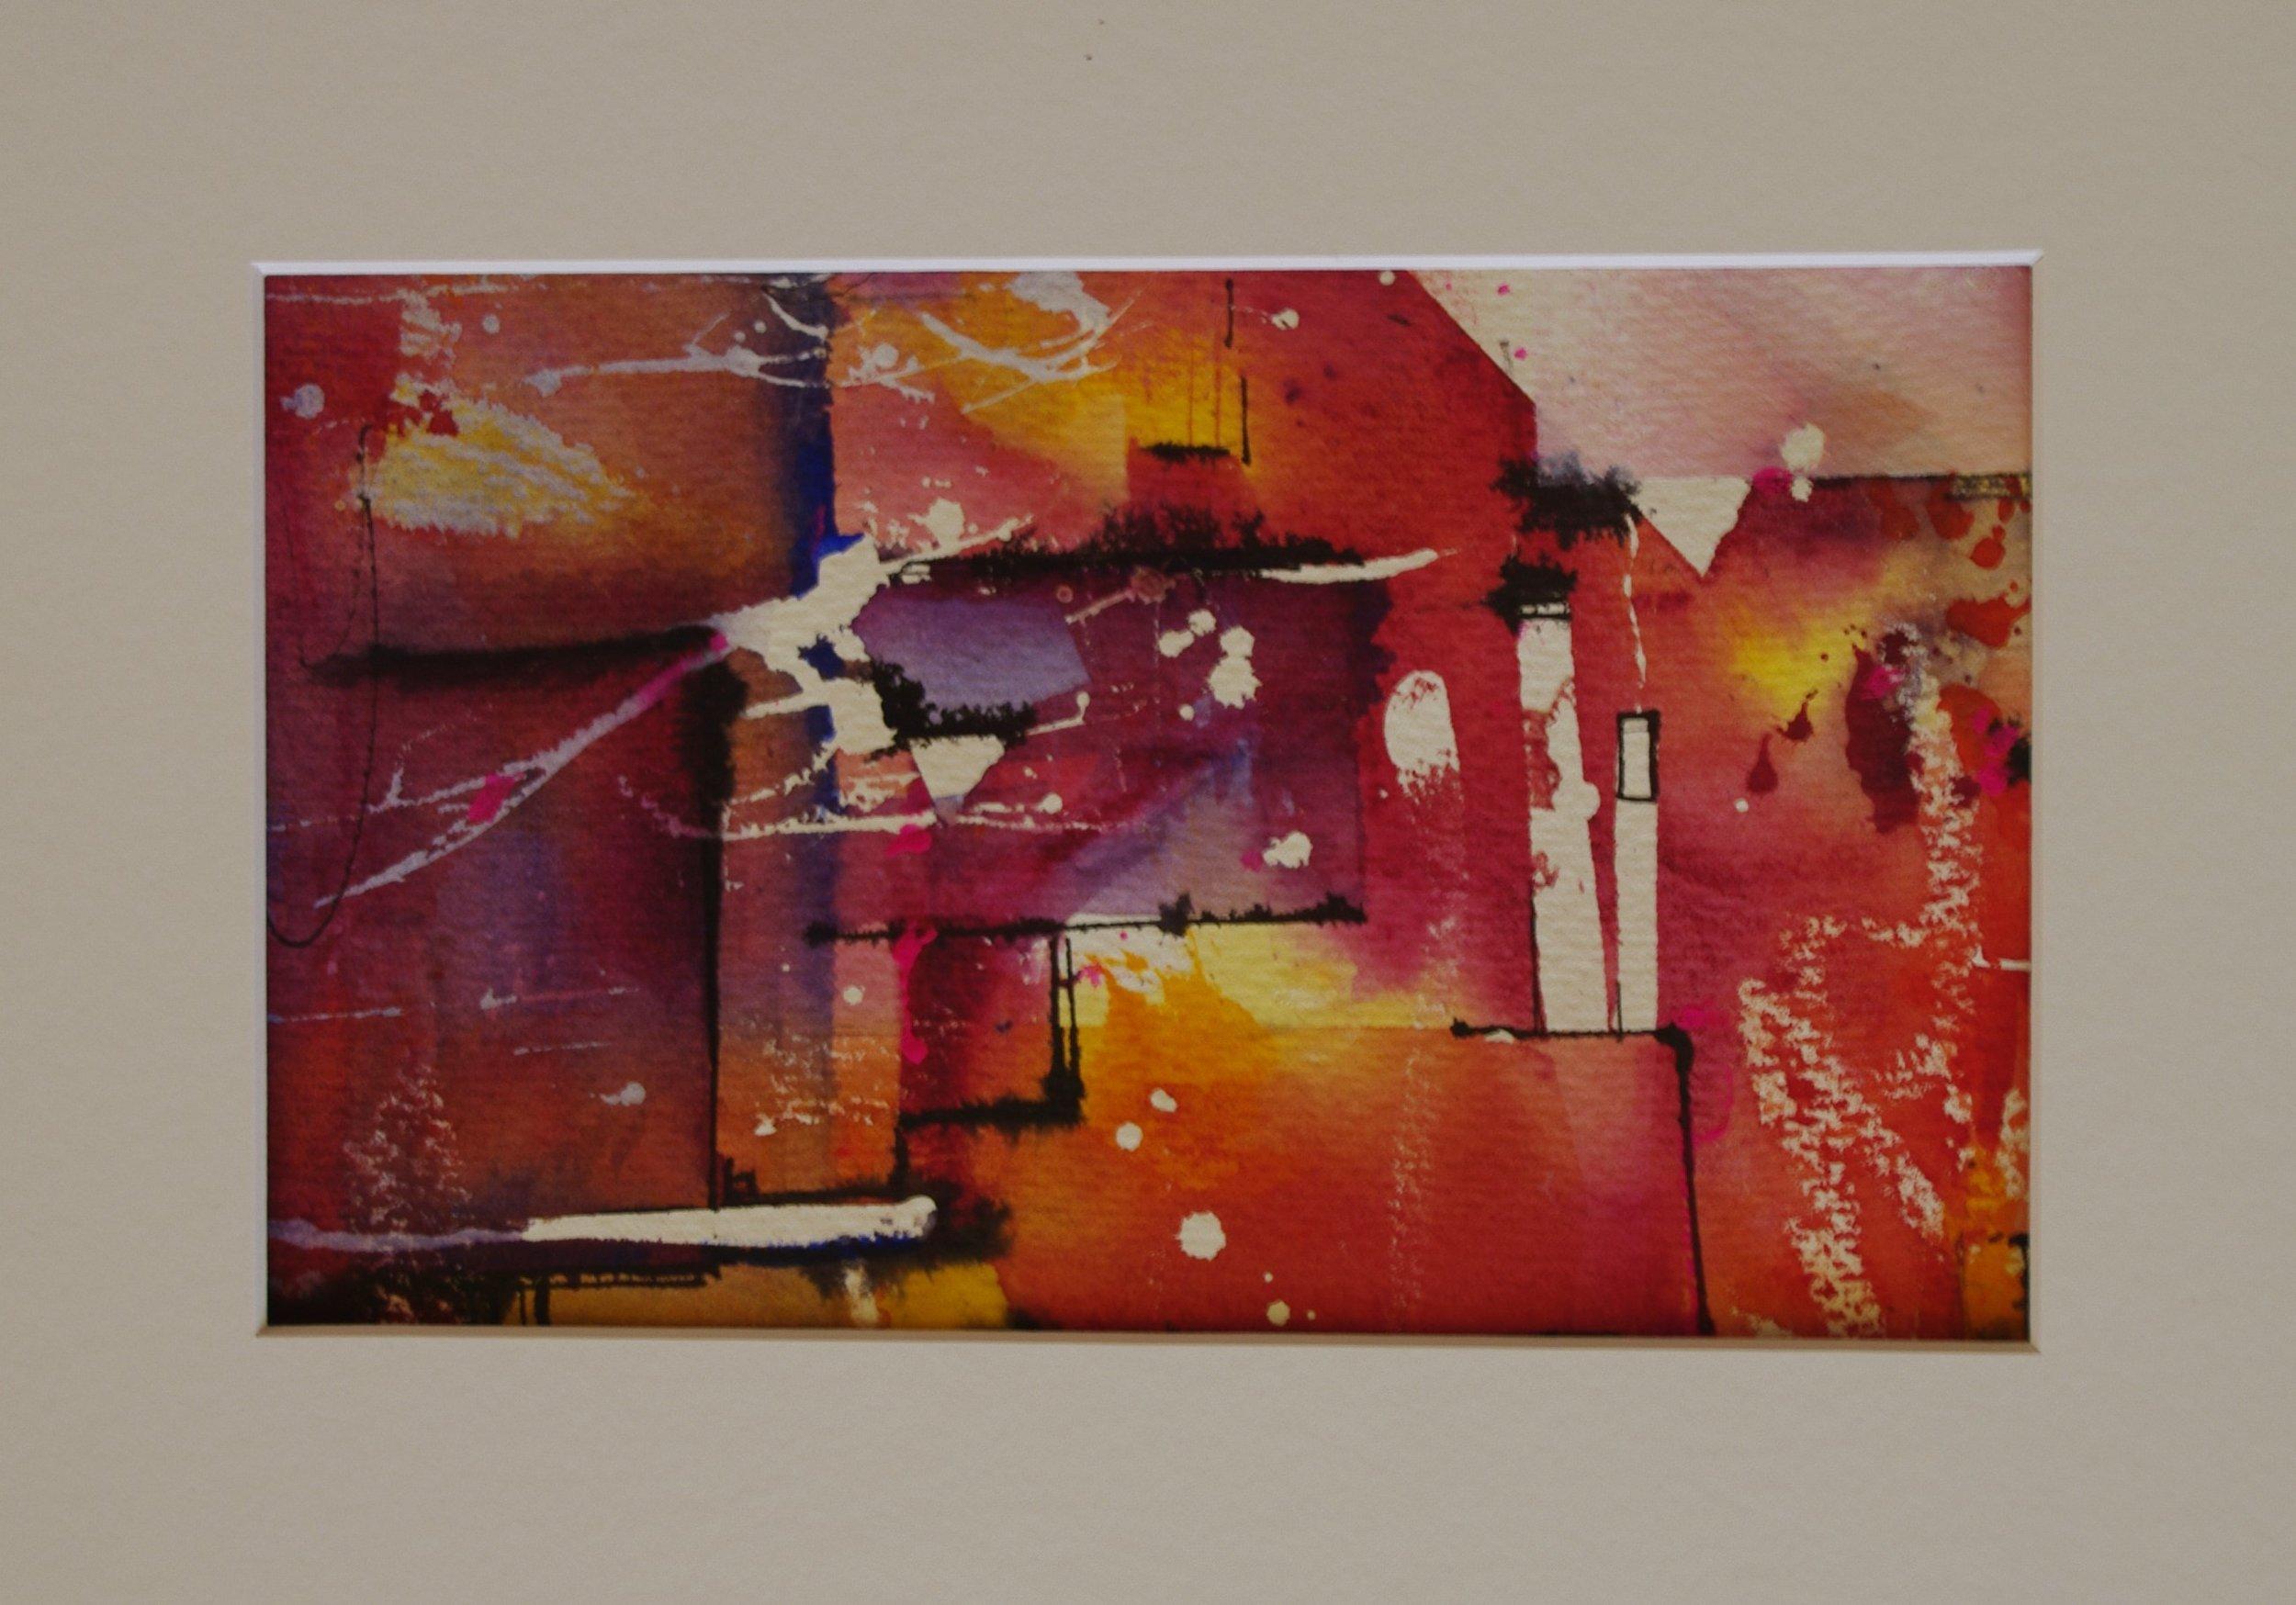 Abstract Orange  21cm x 13cm  Original Watercolour  Unframed   $85